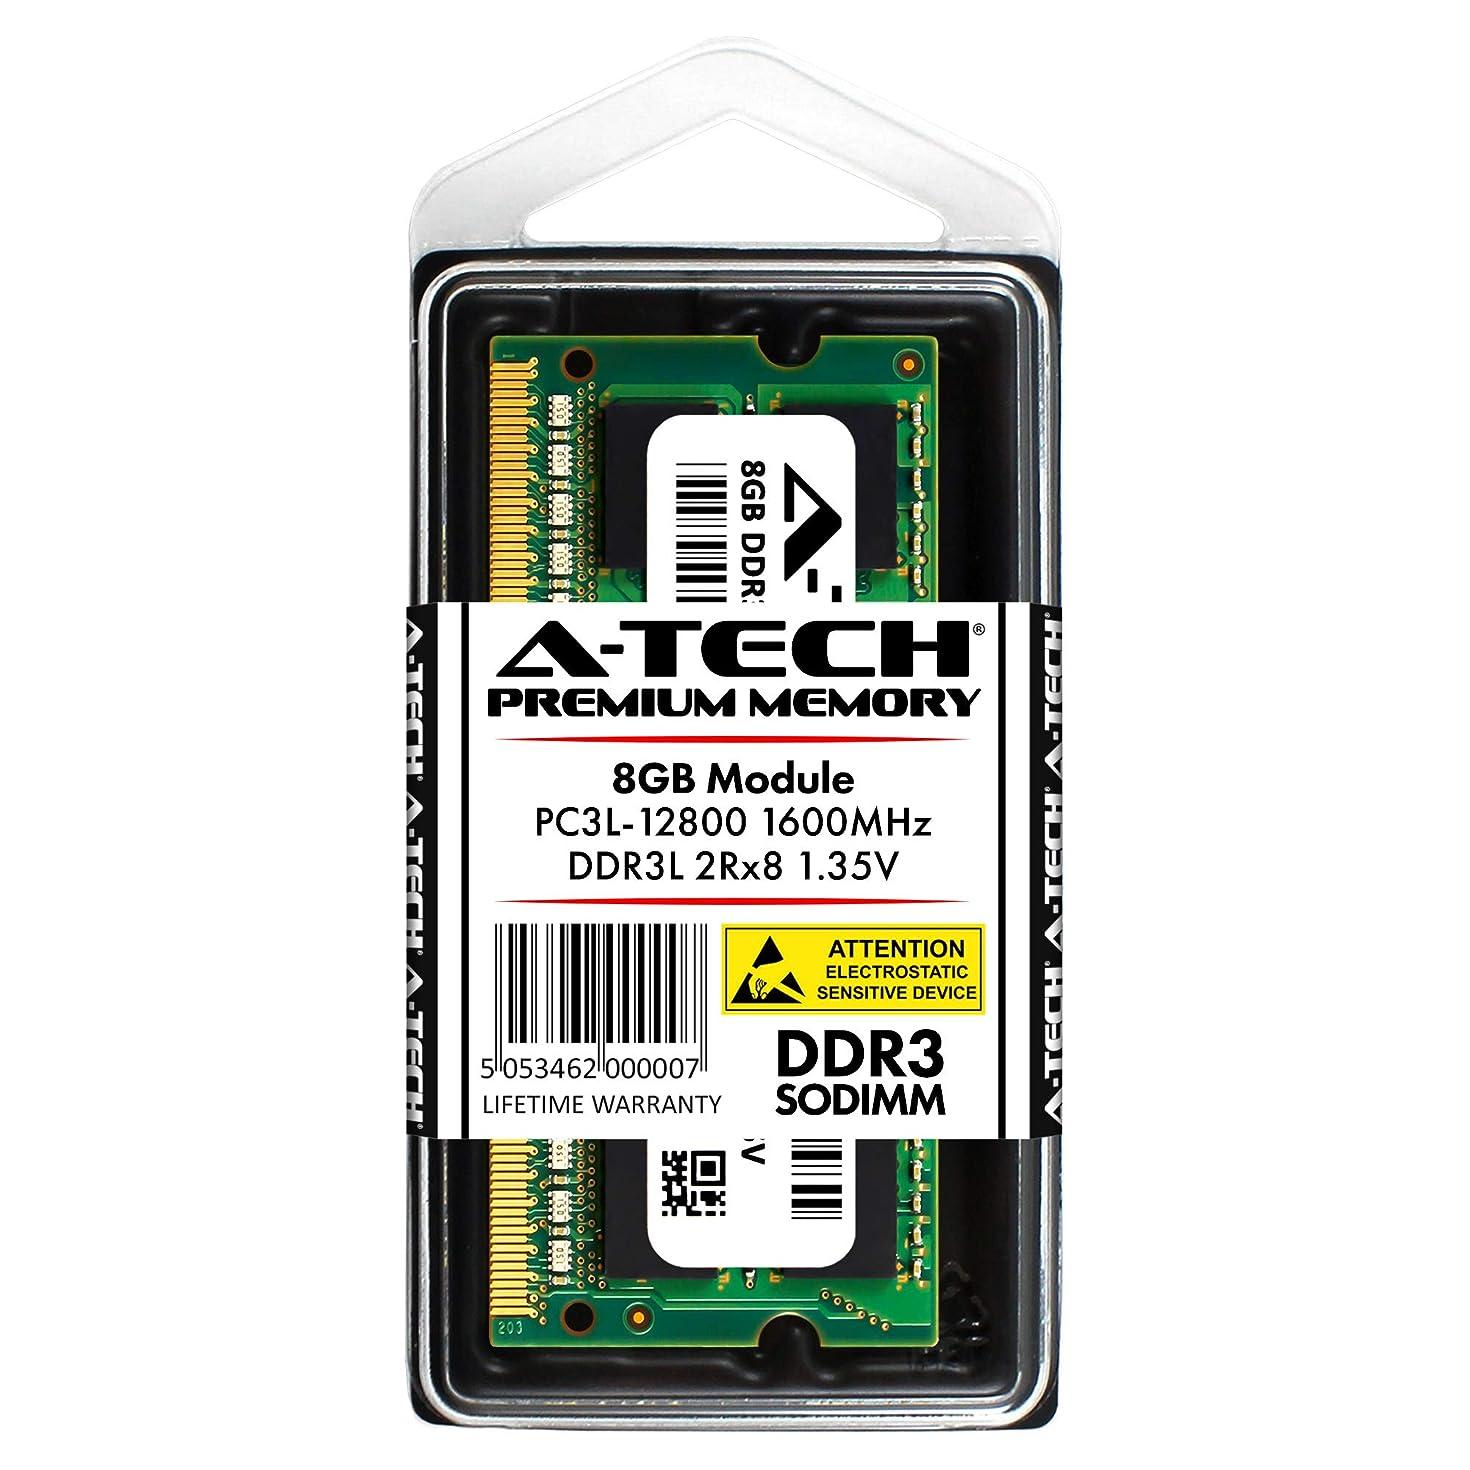 A-Tech 8GB DDR3/DDR3L 1600MHz PC3L-12800 2Rx8 1.35V CL11 Non ECC Unbuffered Low Voltage 204 Pin SODIMM Laptop Notebook Computer Memory Ram Upgrade